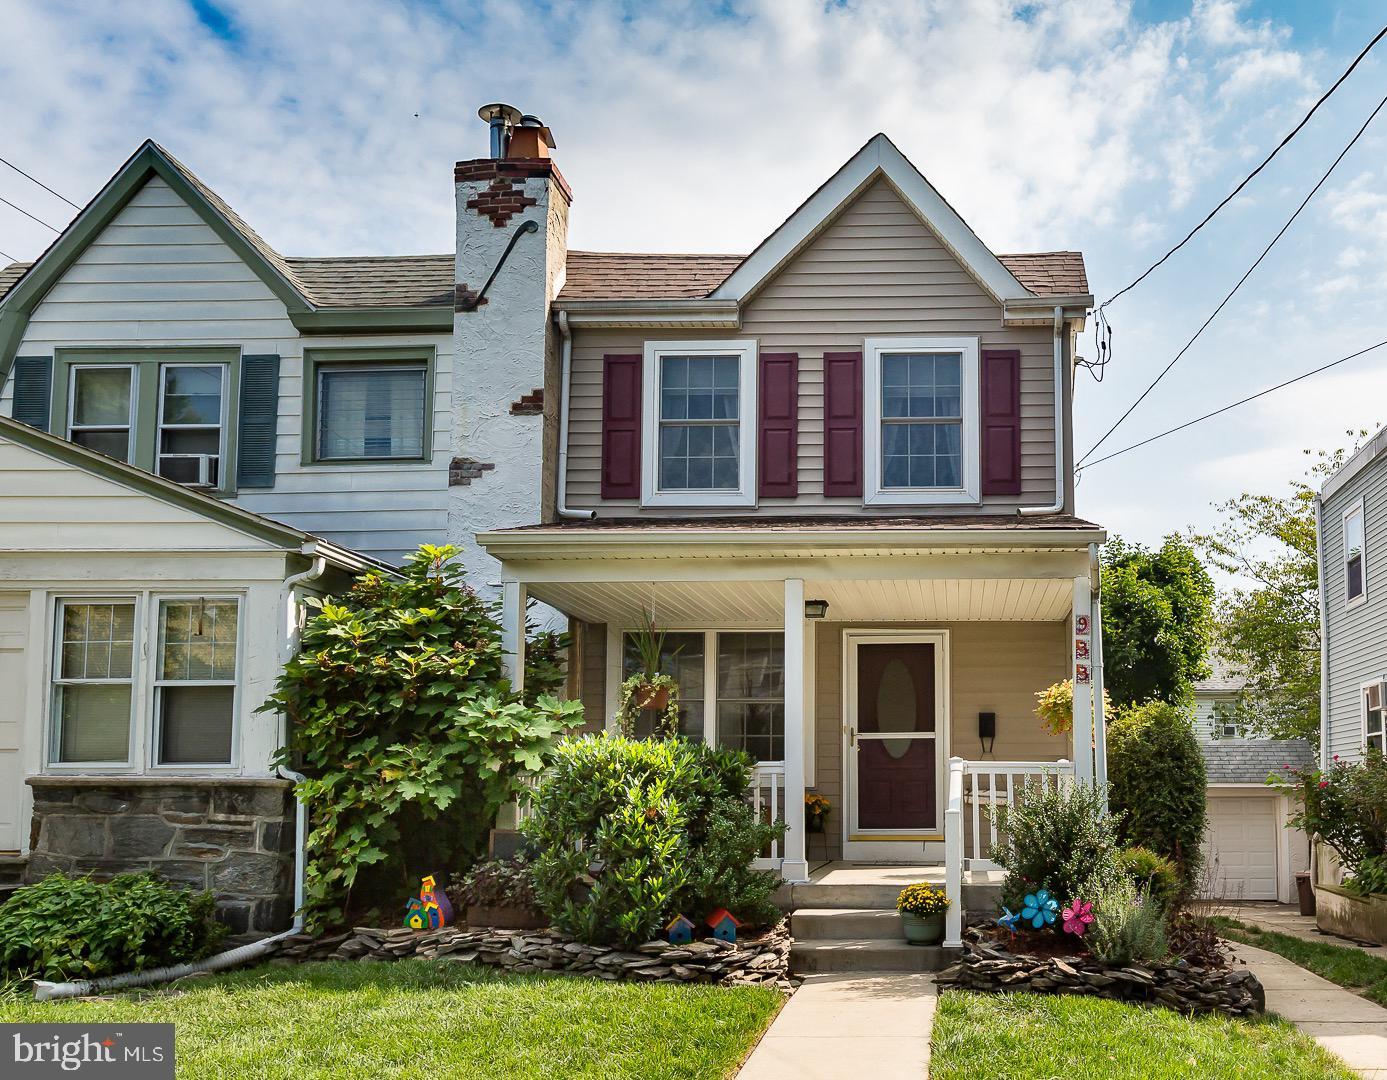 933 Anderson Avenue Drexel Hill, PA 19026